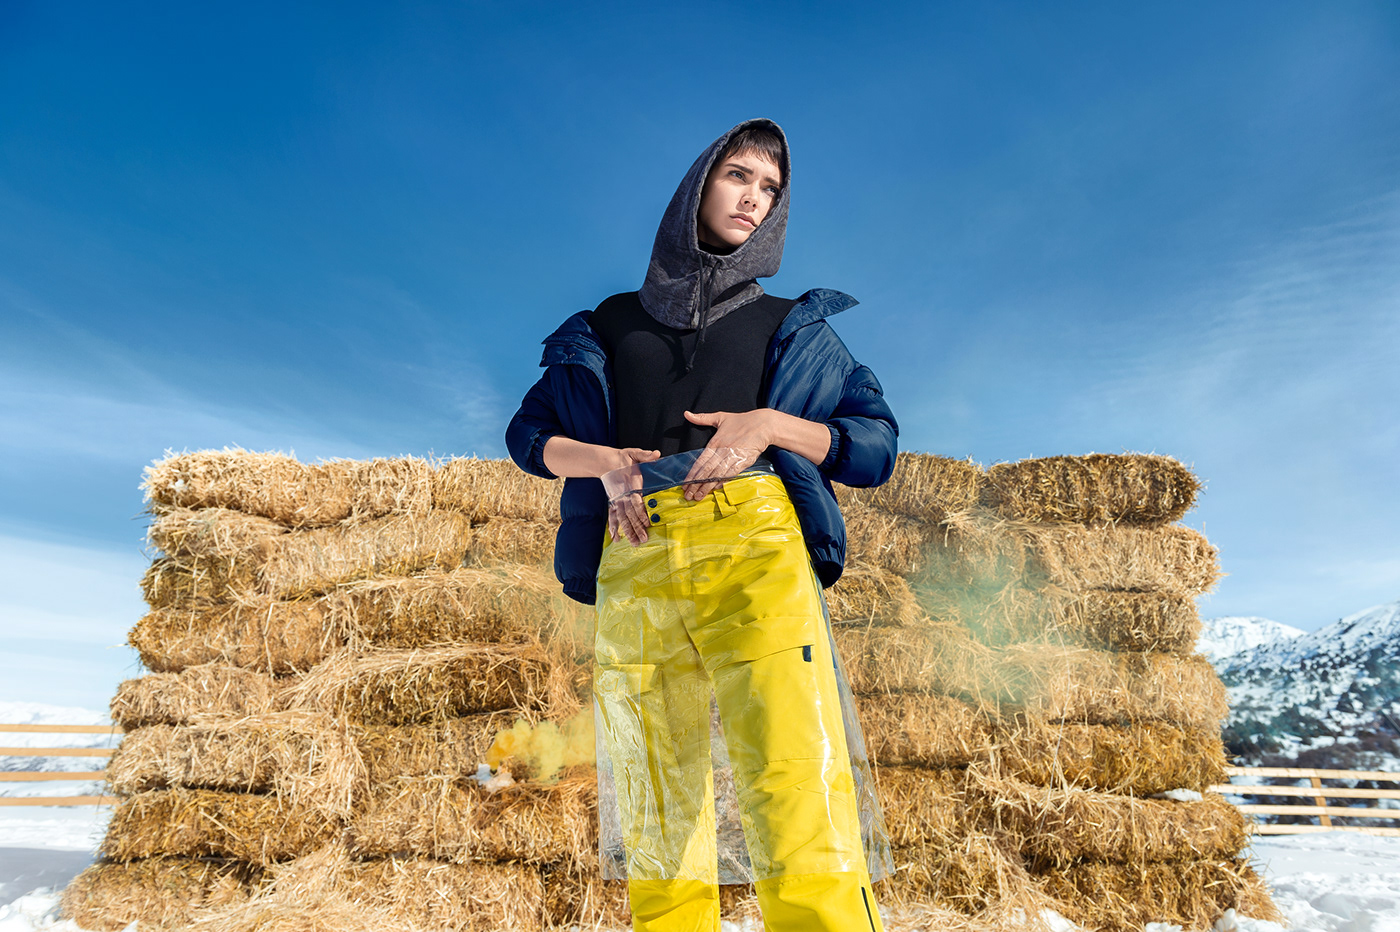 cafbasia colors Fashion  model photo Style tashkent uzbekistan winter woman